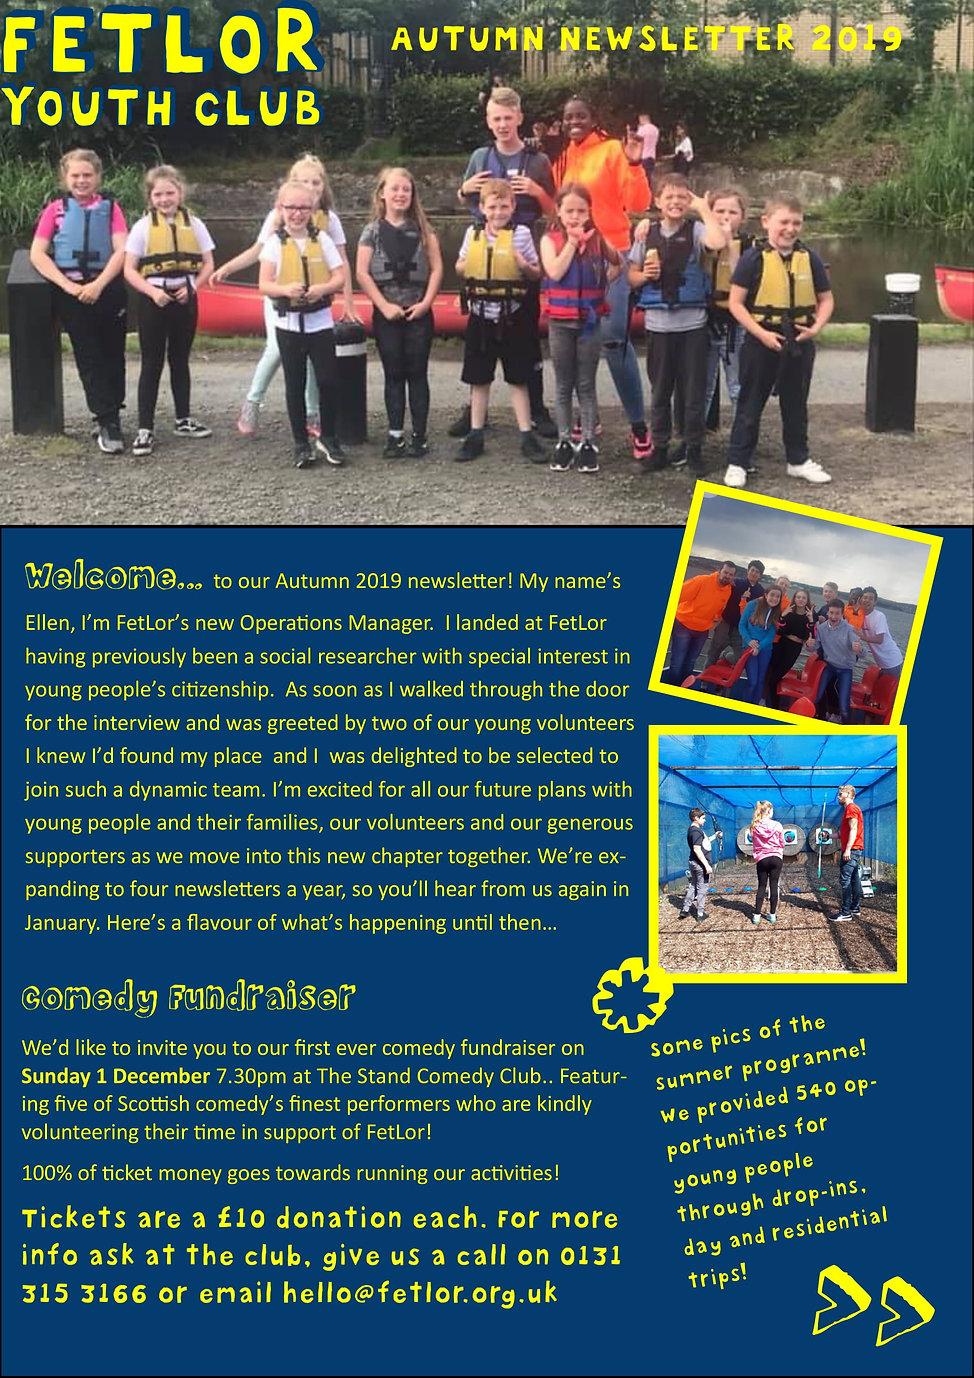 FetLor Youth Club Autumn newsletter 2019